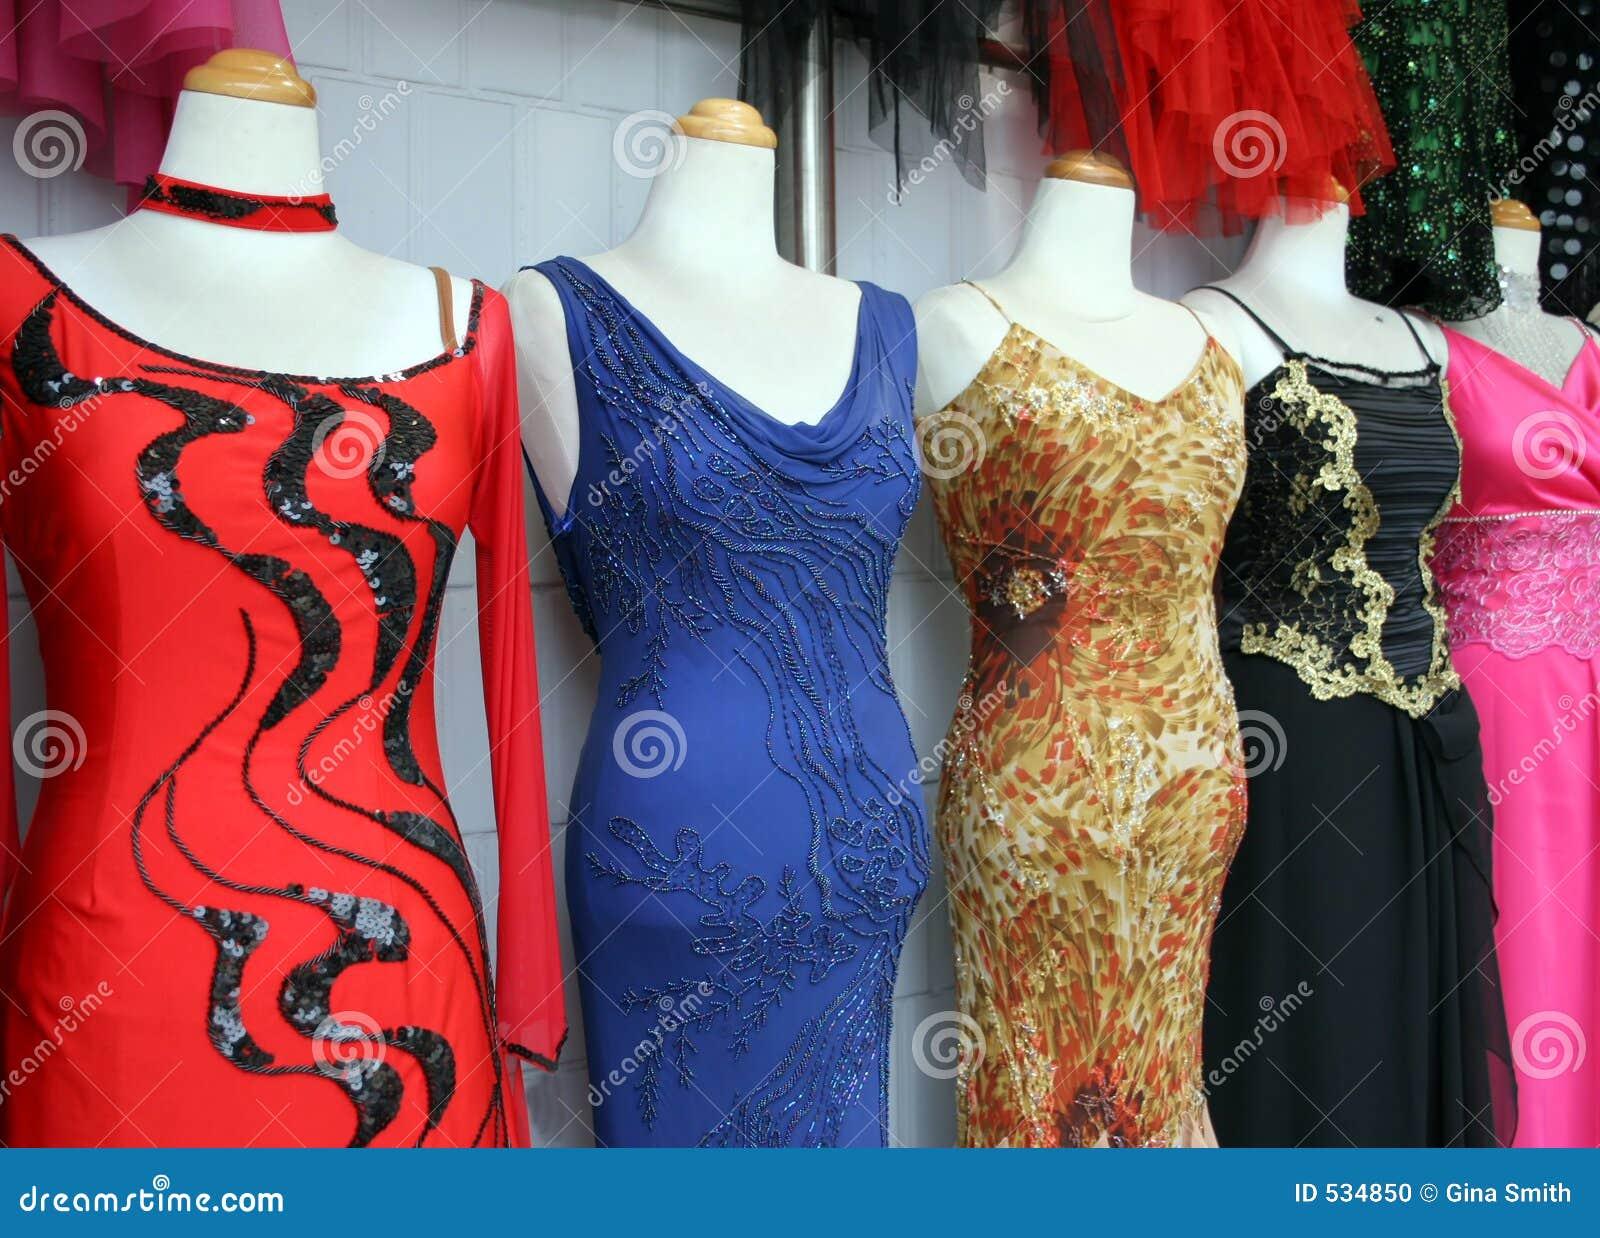 Download 礼服 库存照片. 图片 包括有 可爱, glamor, 当事人, 夜间, beautifuler, 服装, 天鹅绒 - 534850